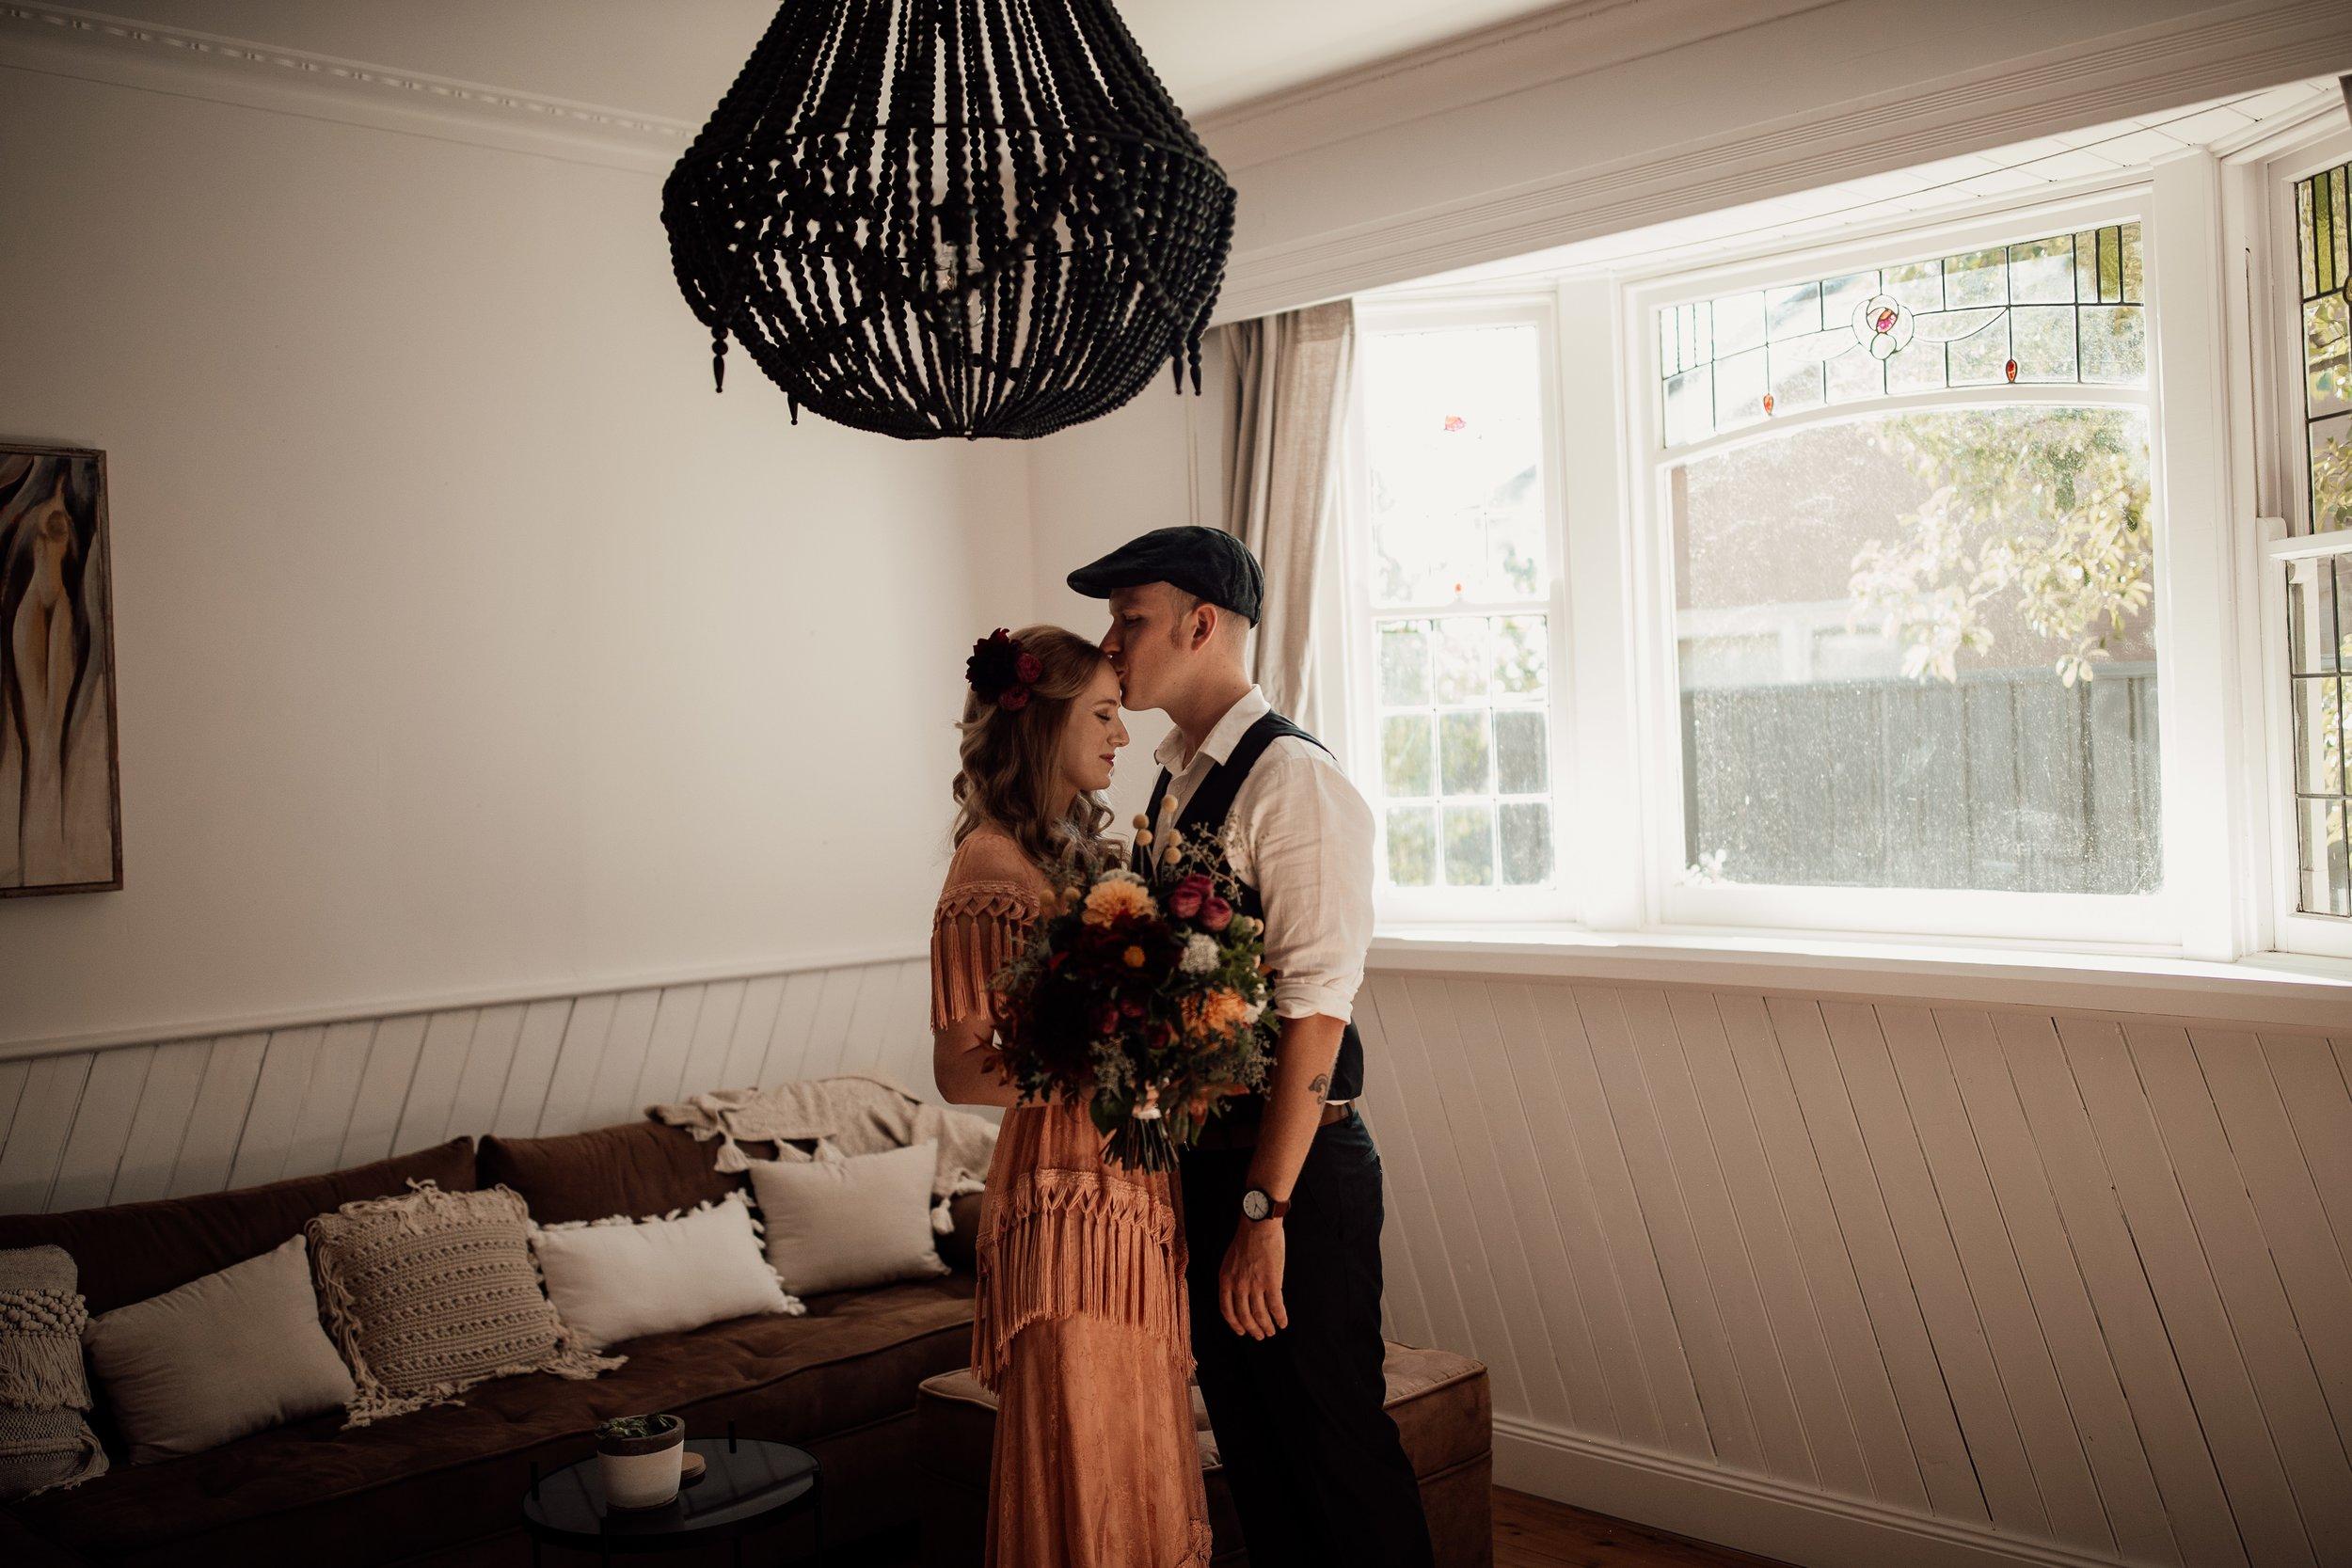 mickalathomas_puremacphotography_weddingphotographer_couplephotographer_Sheppartonphotographer_2108.jpg